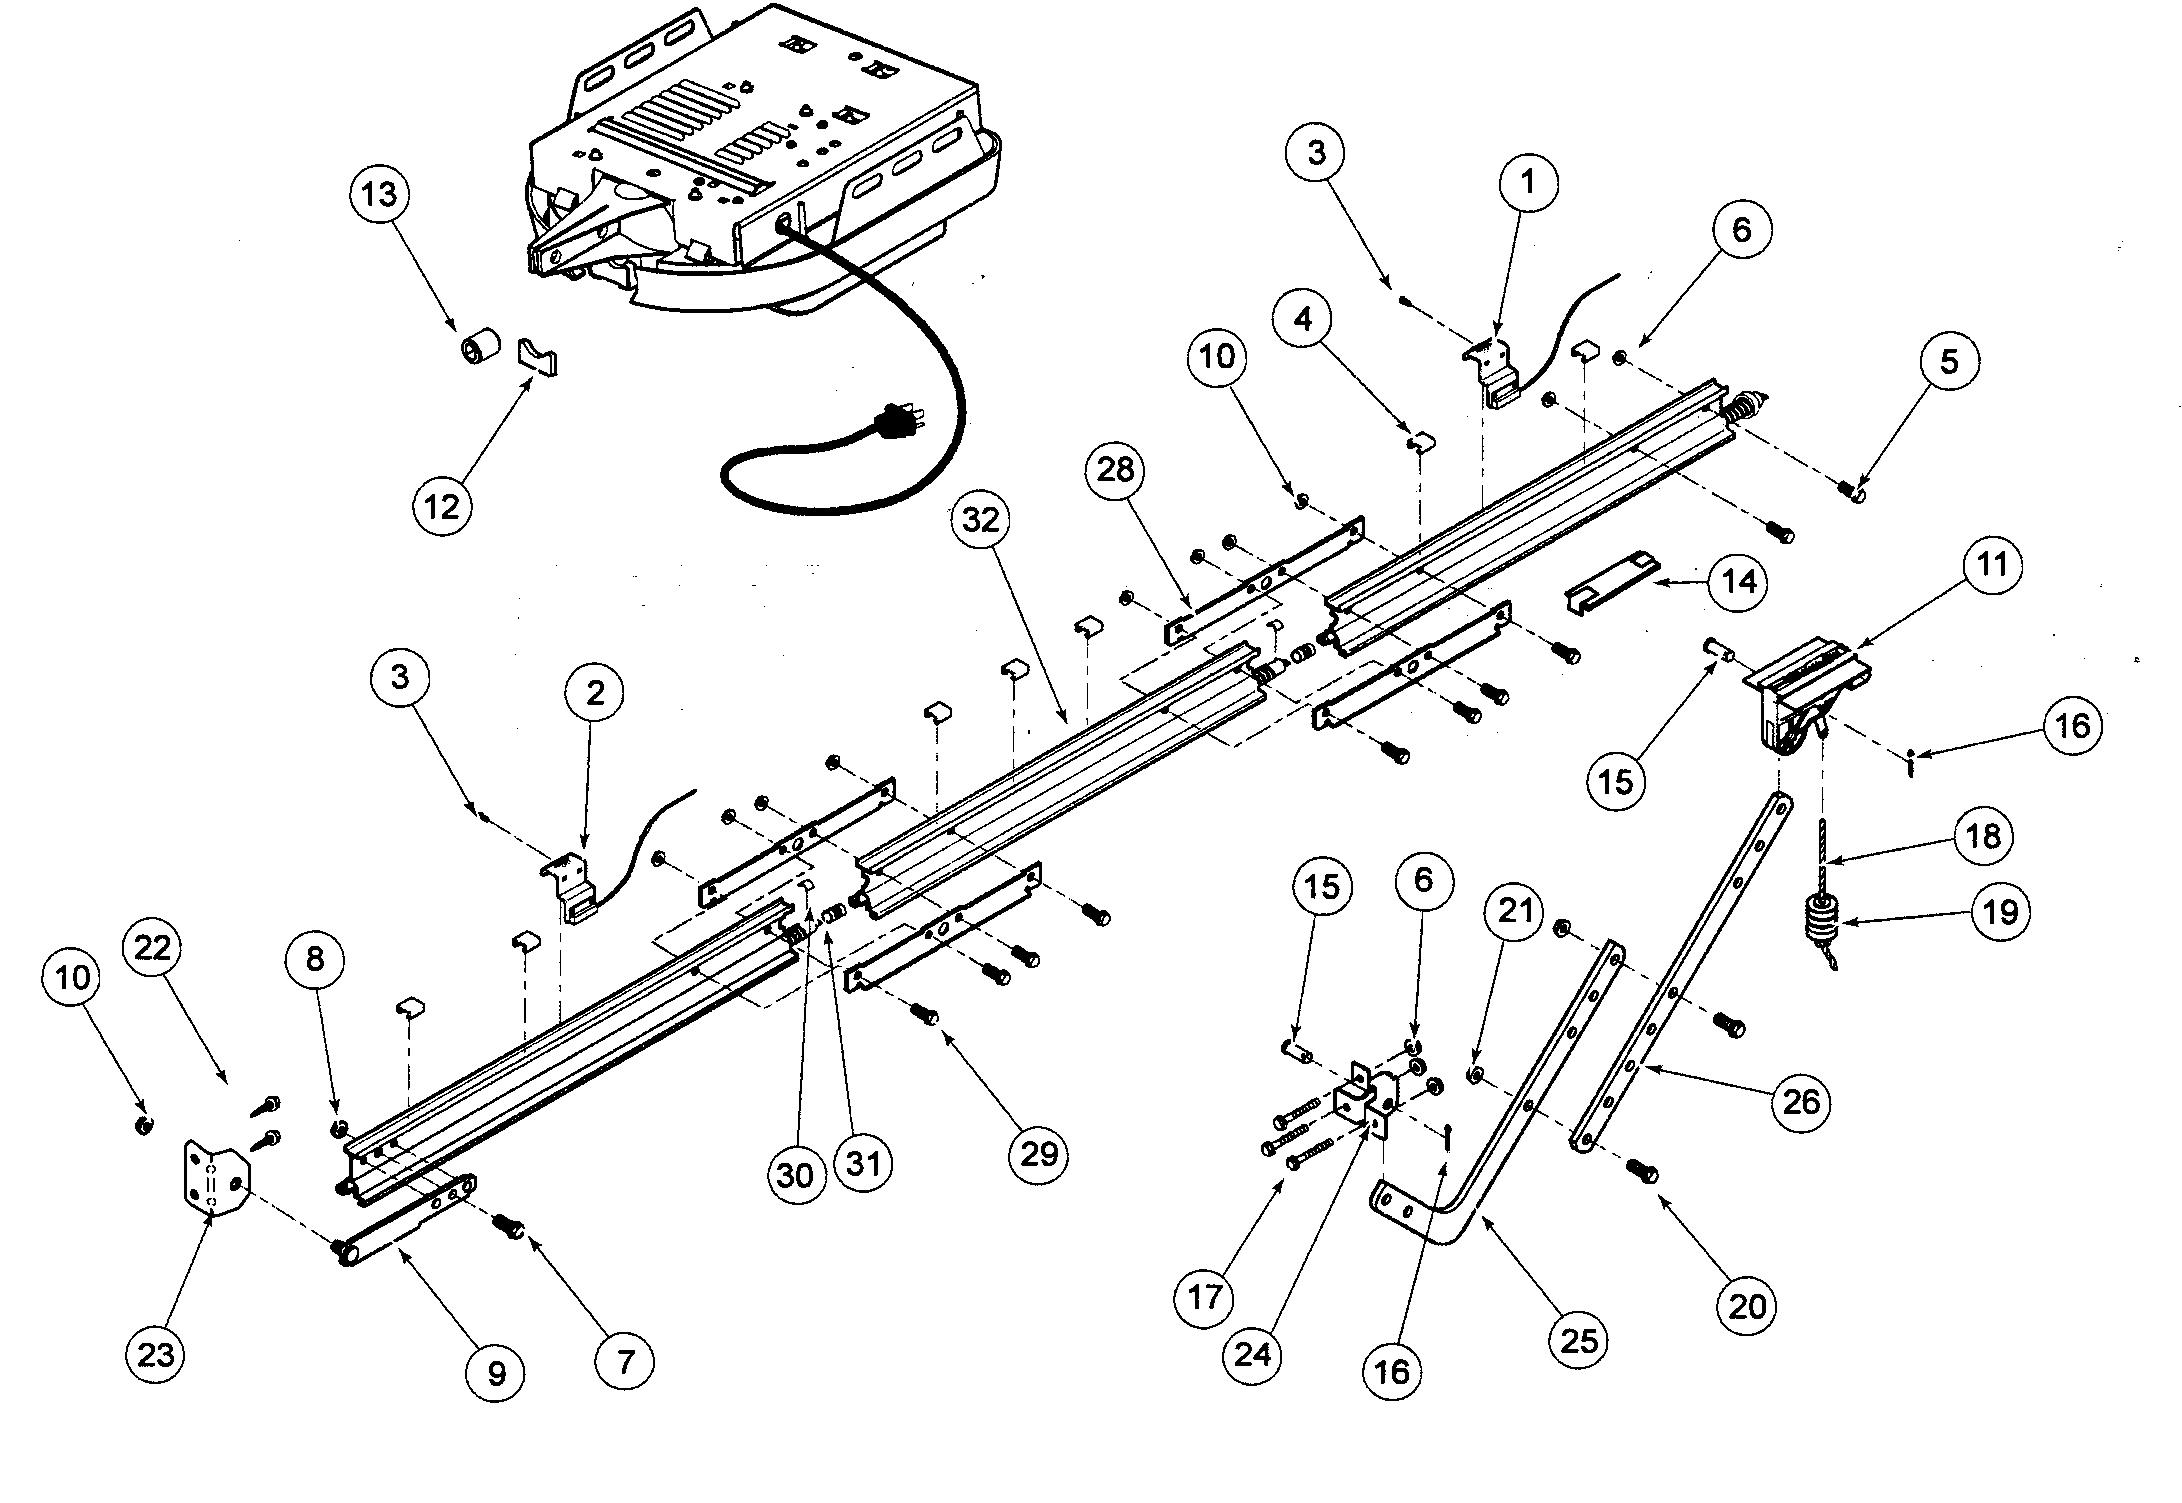 RAIL ASSY Diagram & Parts List for Model isd1000 Genie